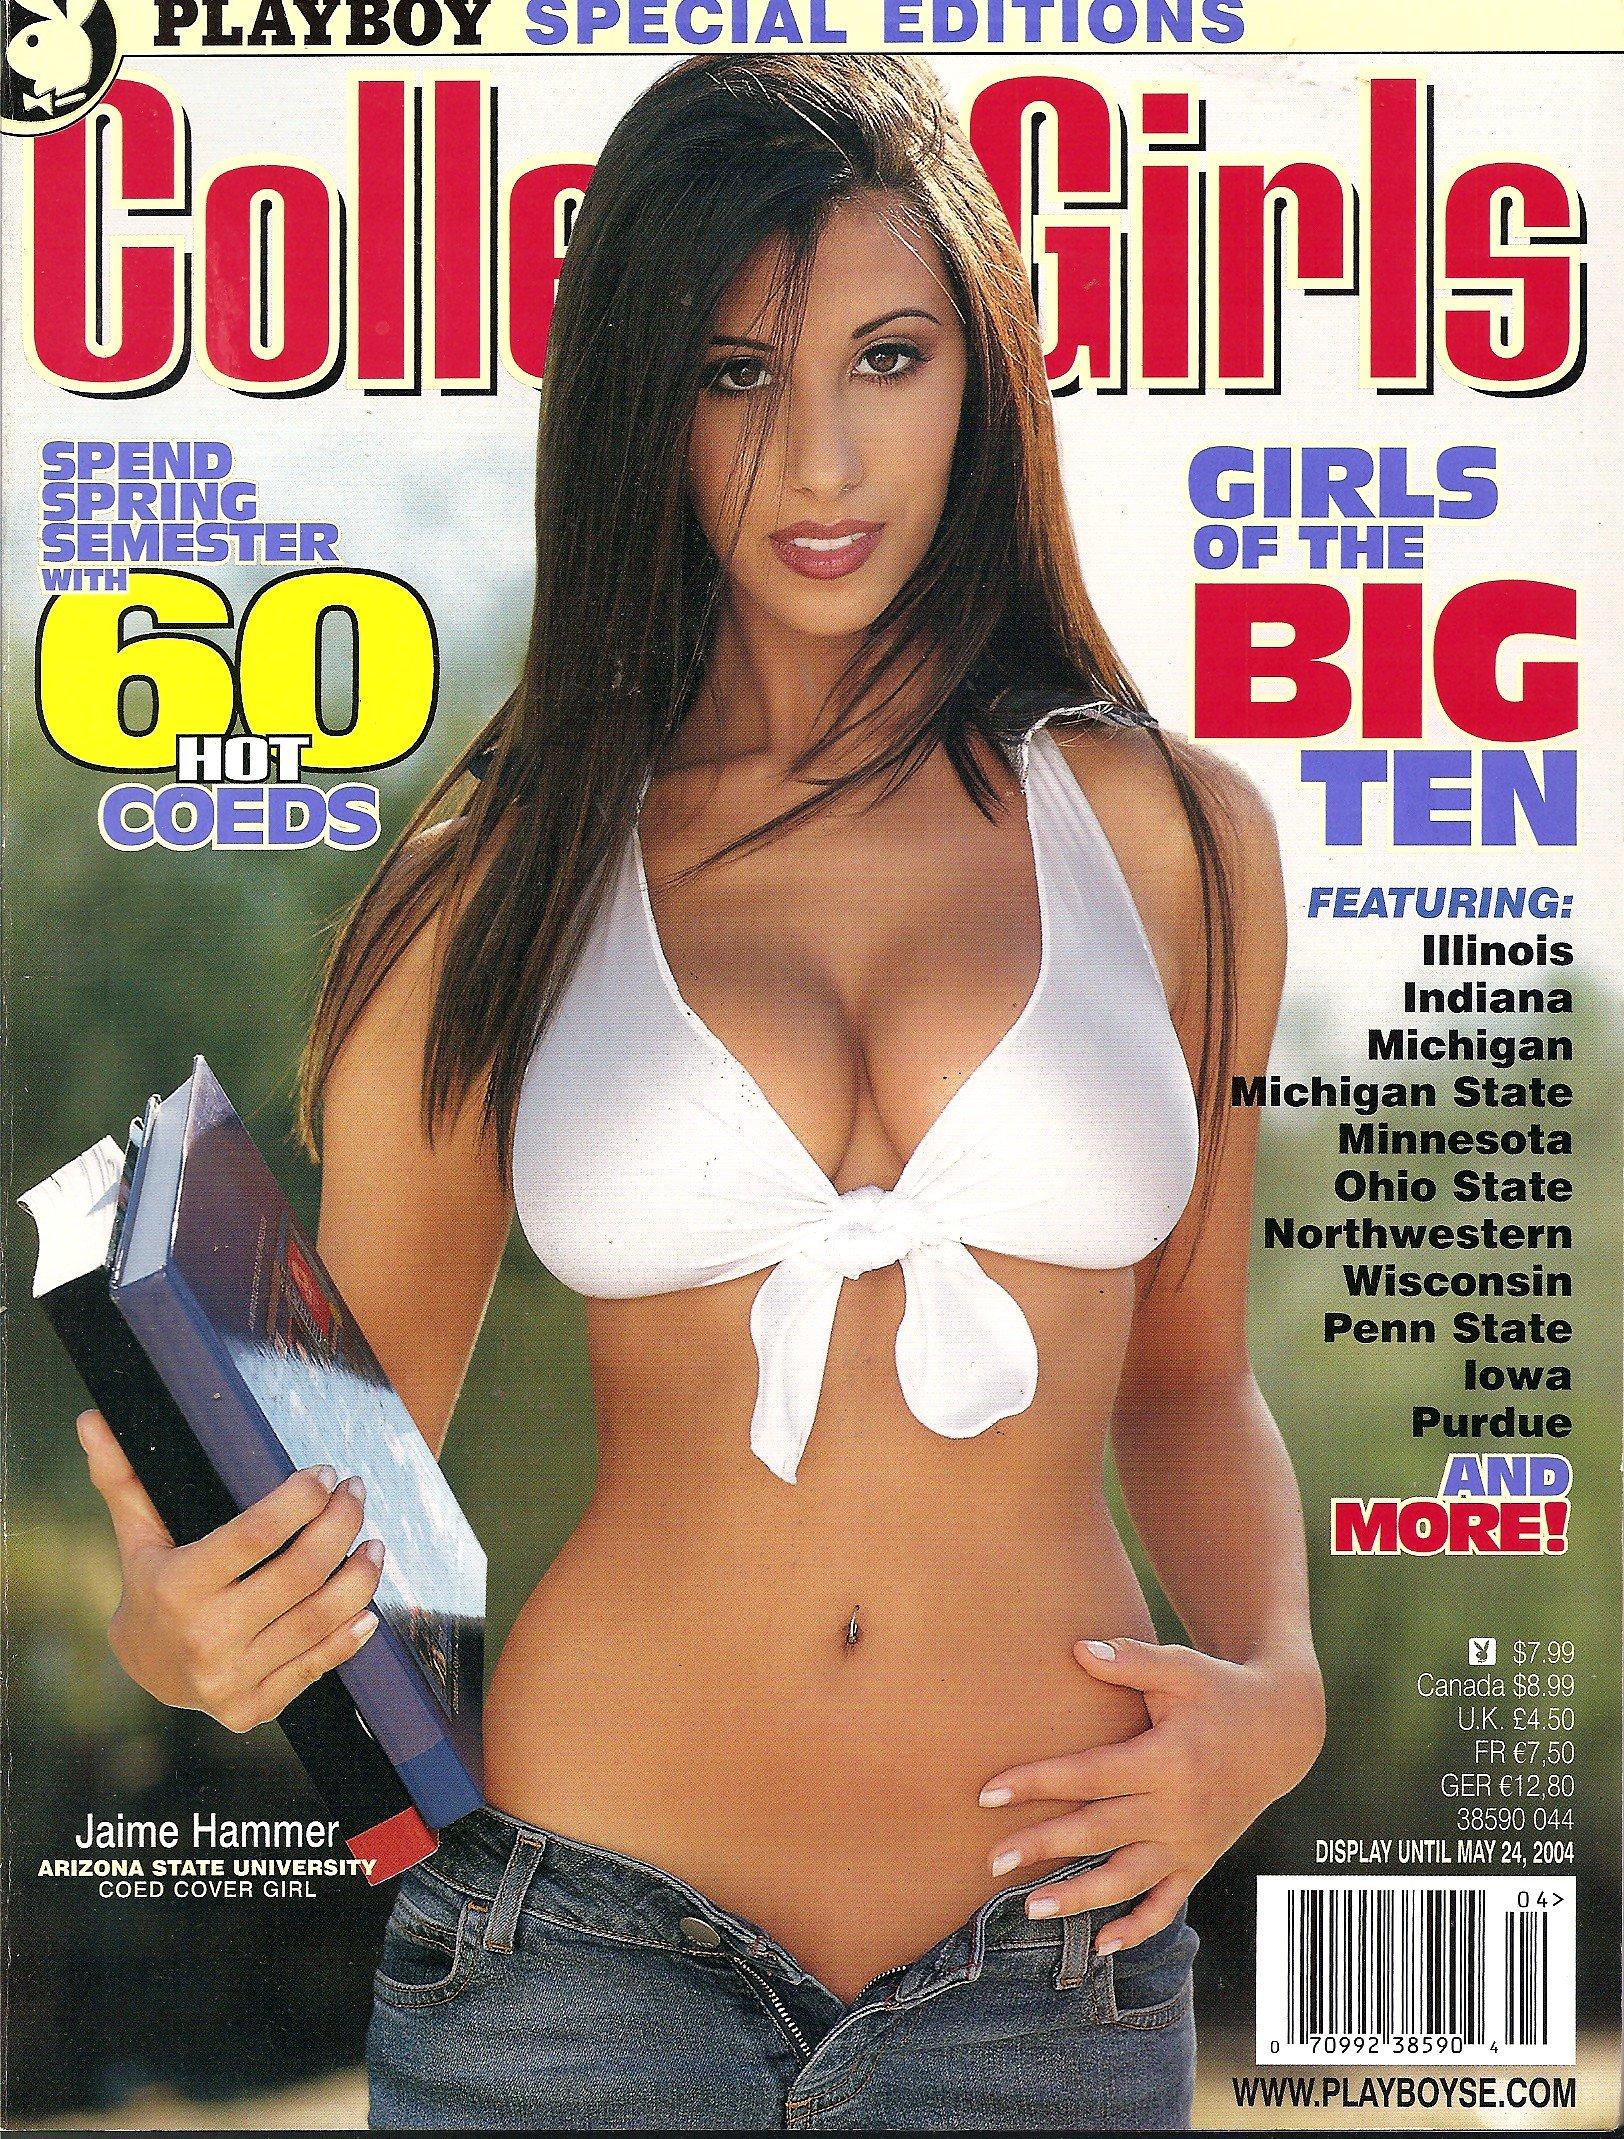 Playboy's college girls nov